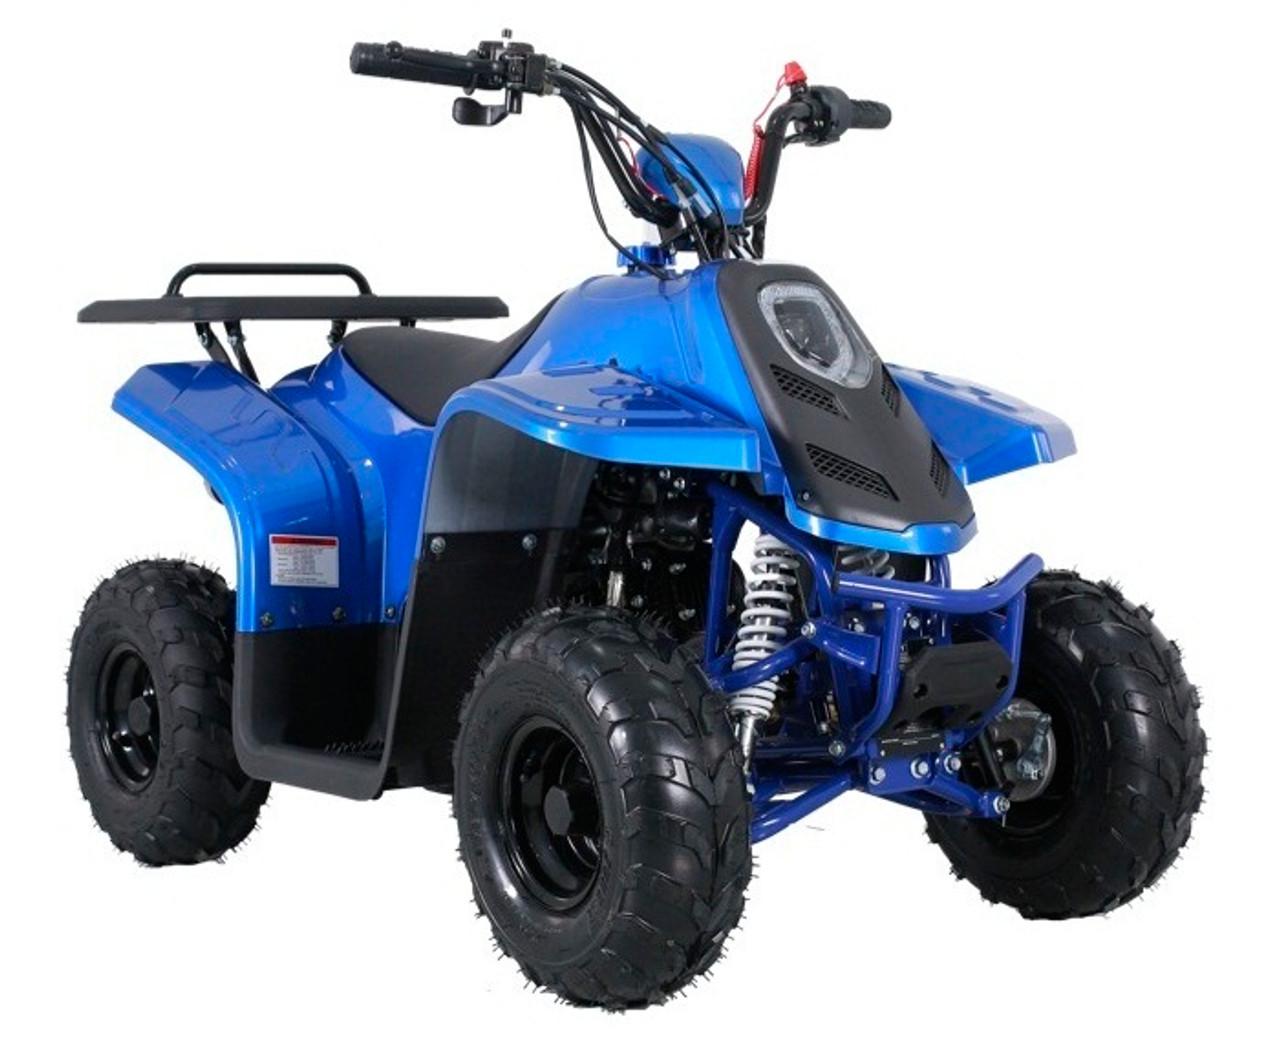 Taotao Rock 110 ATV